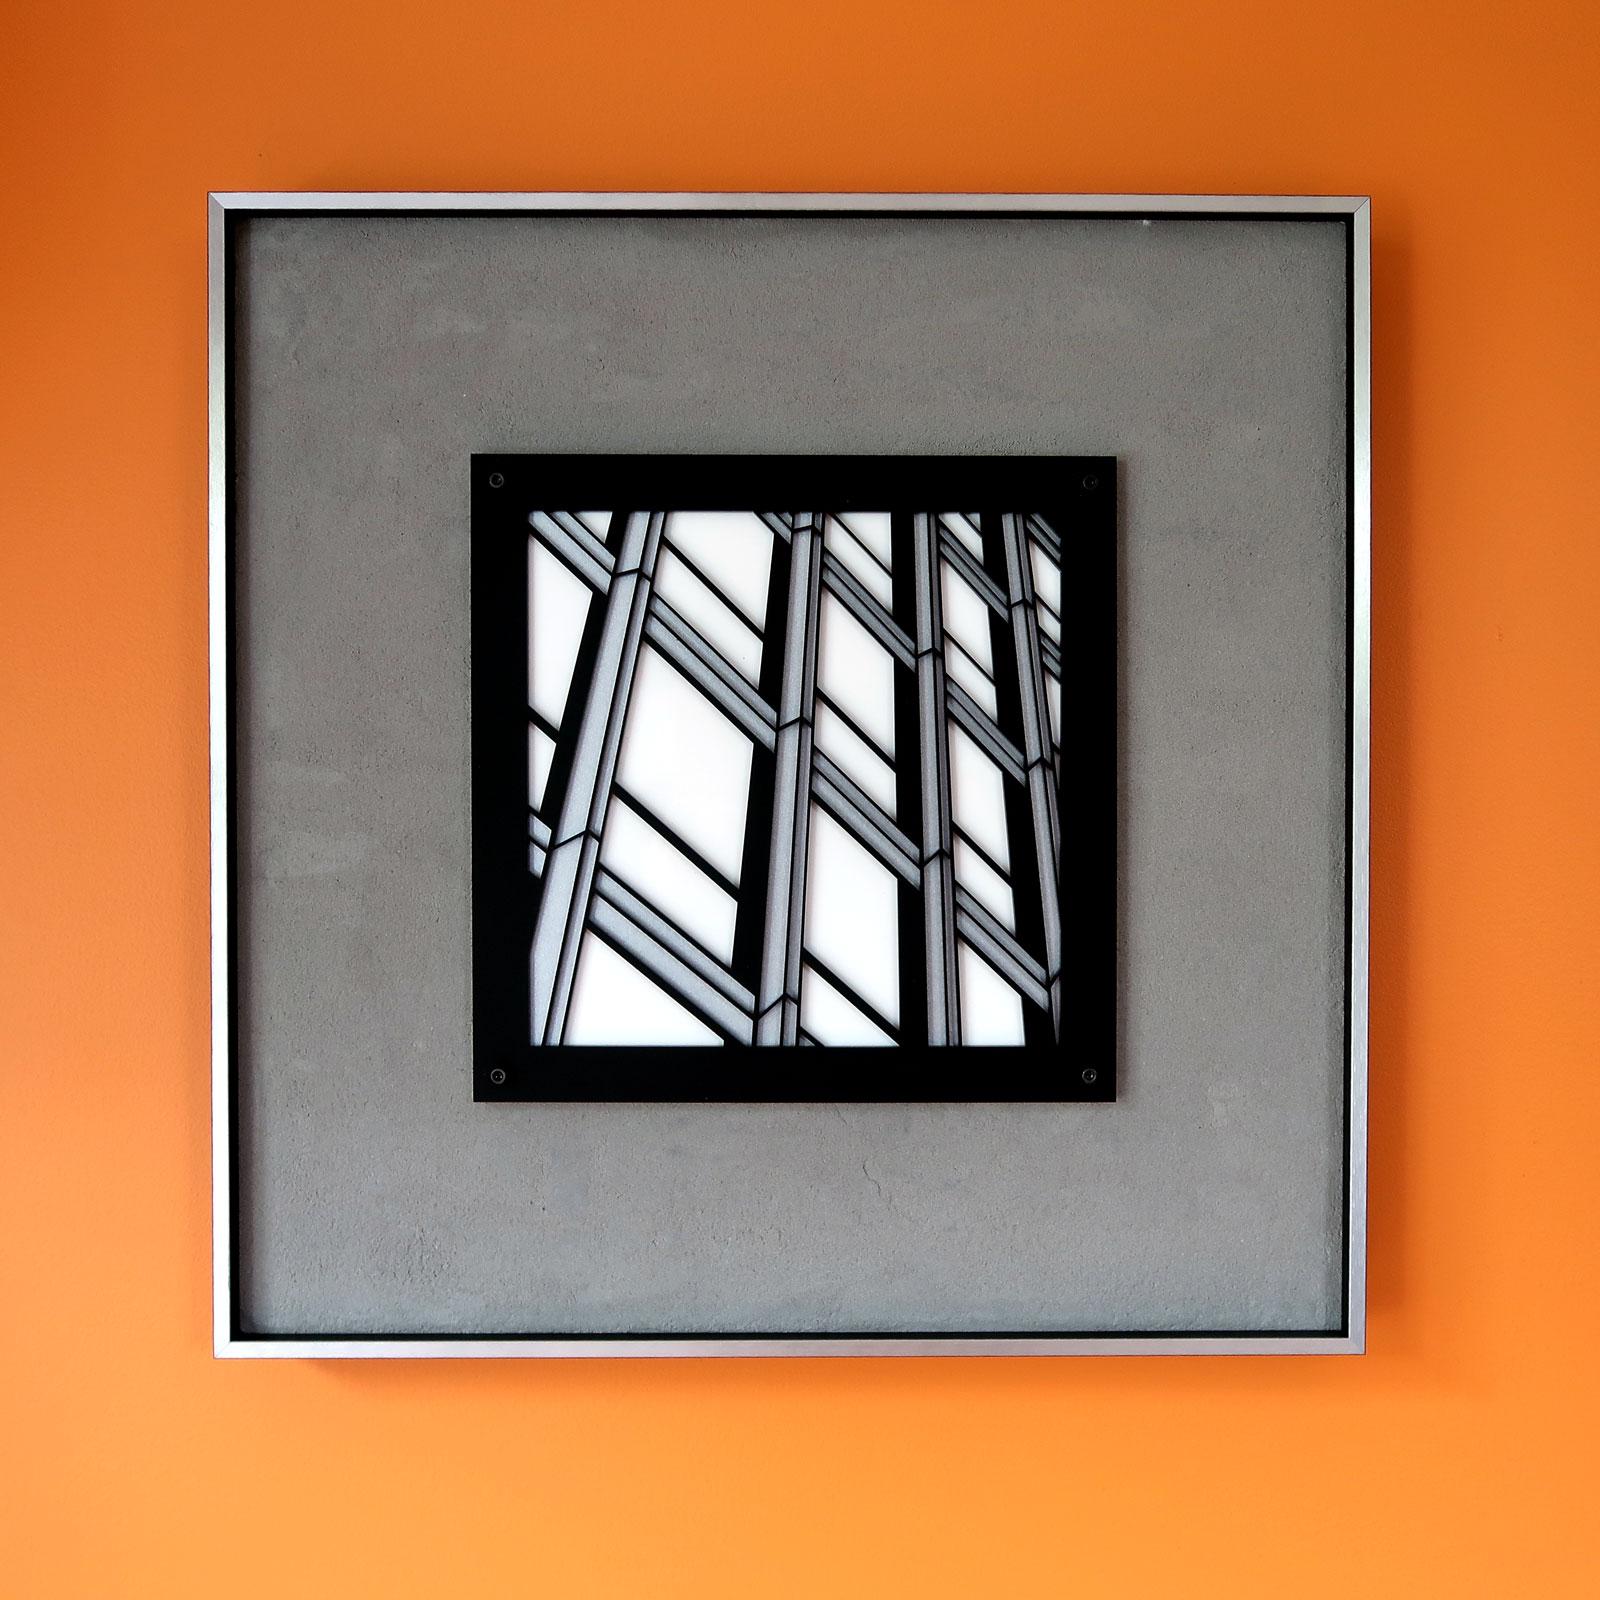 "Join | lasercut acrylic artist print 15"" framed c Heather Hancock 2019"